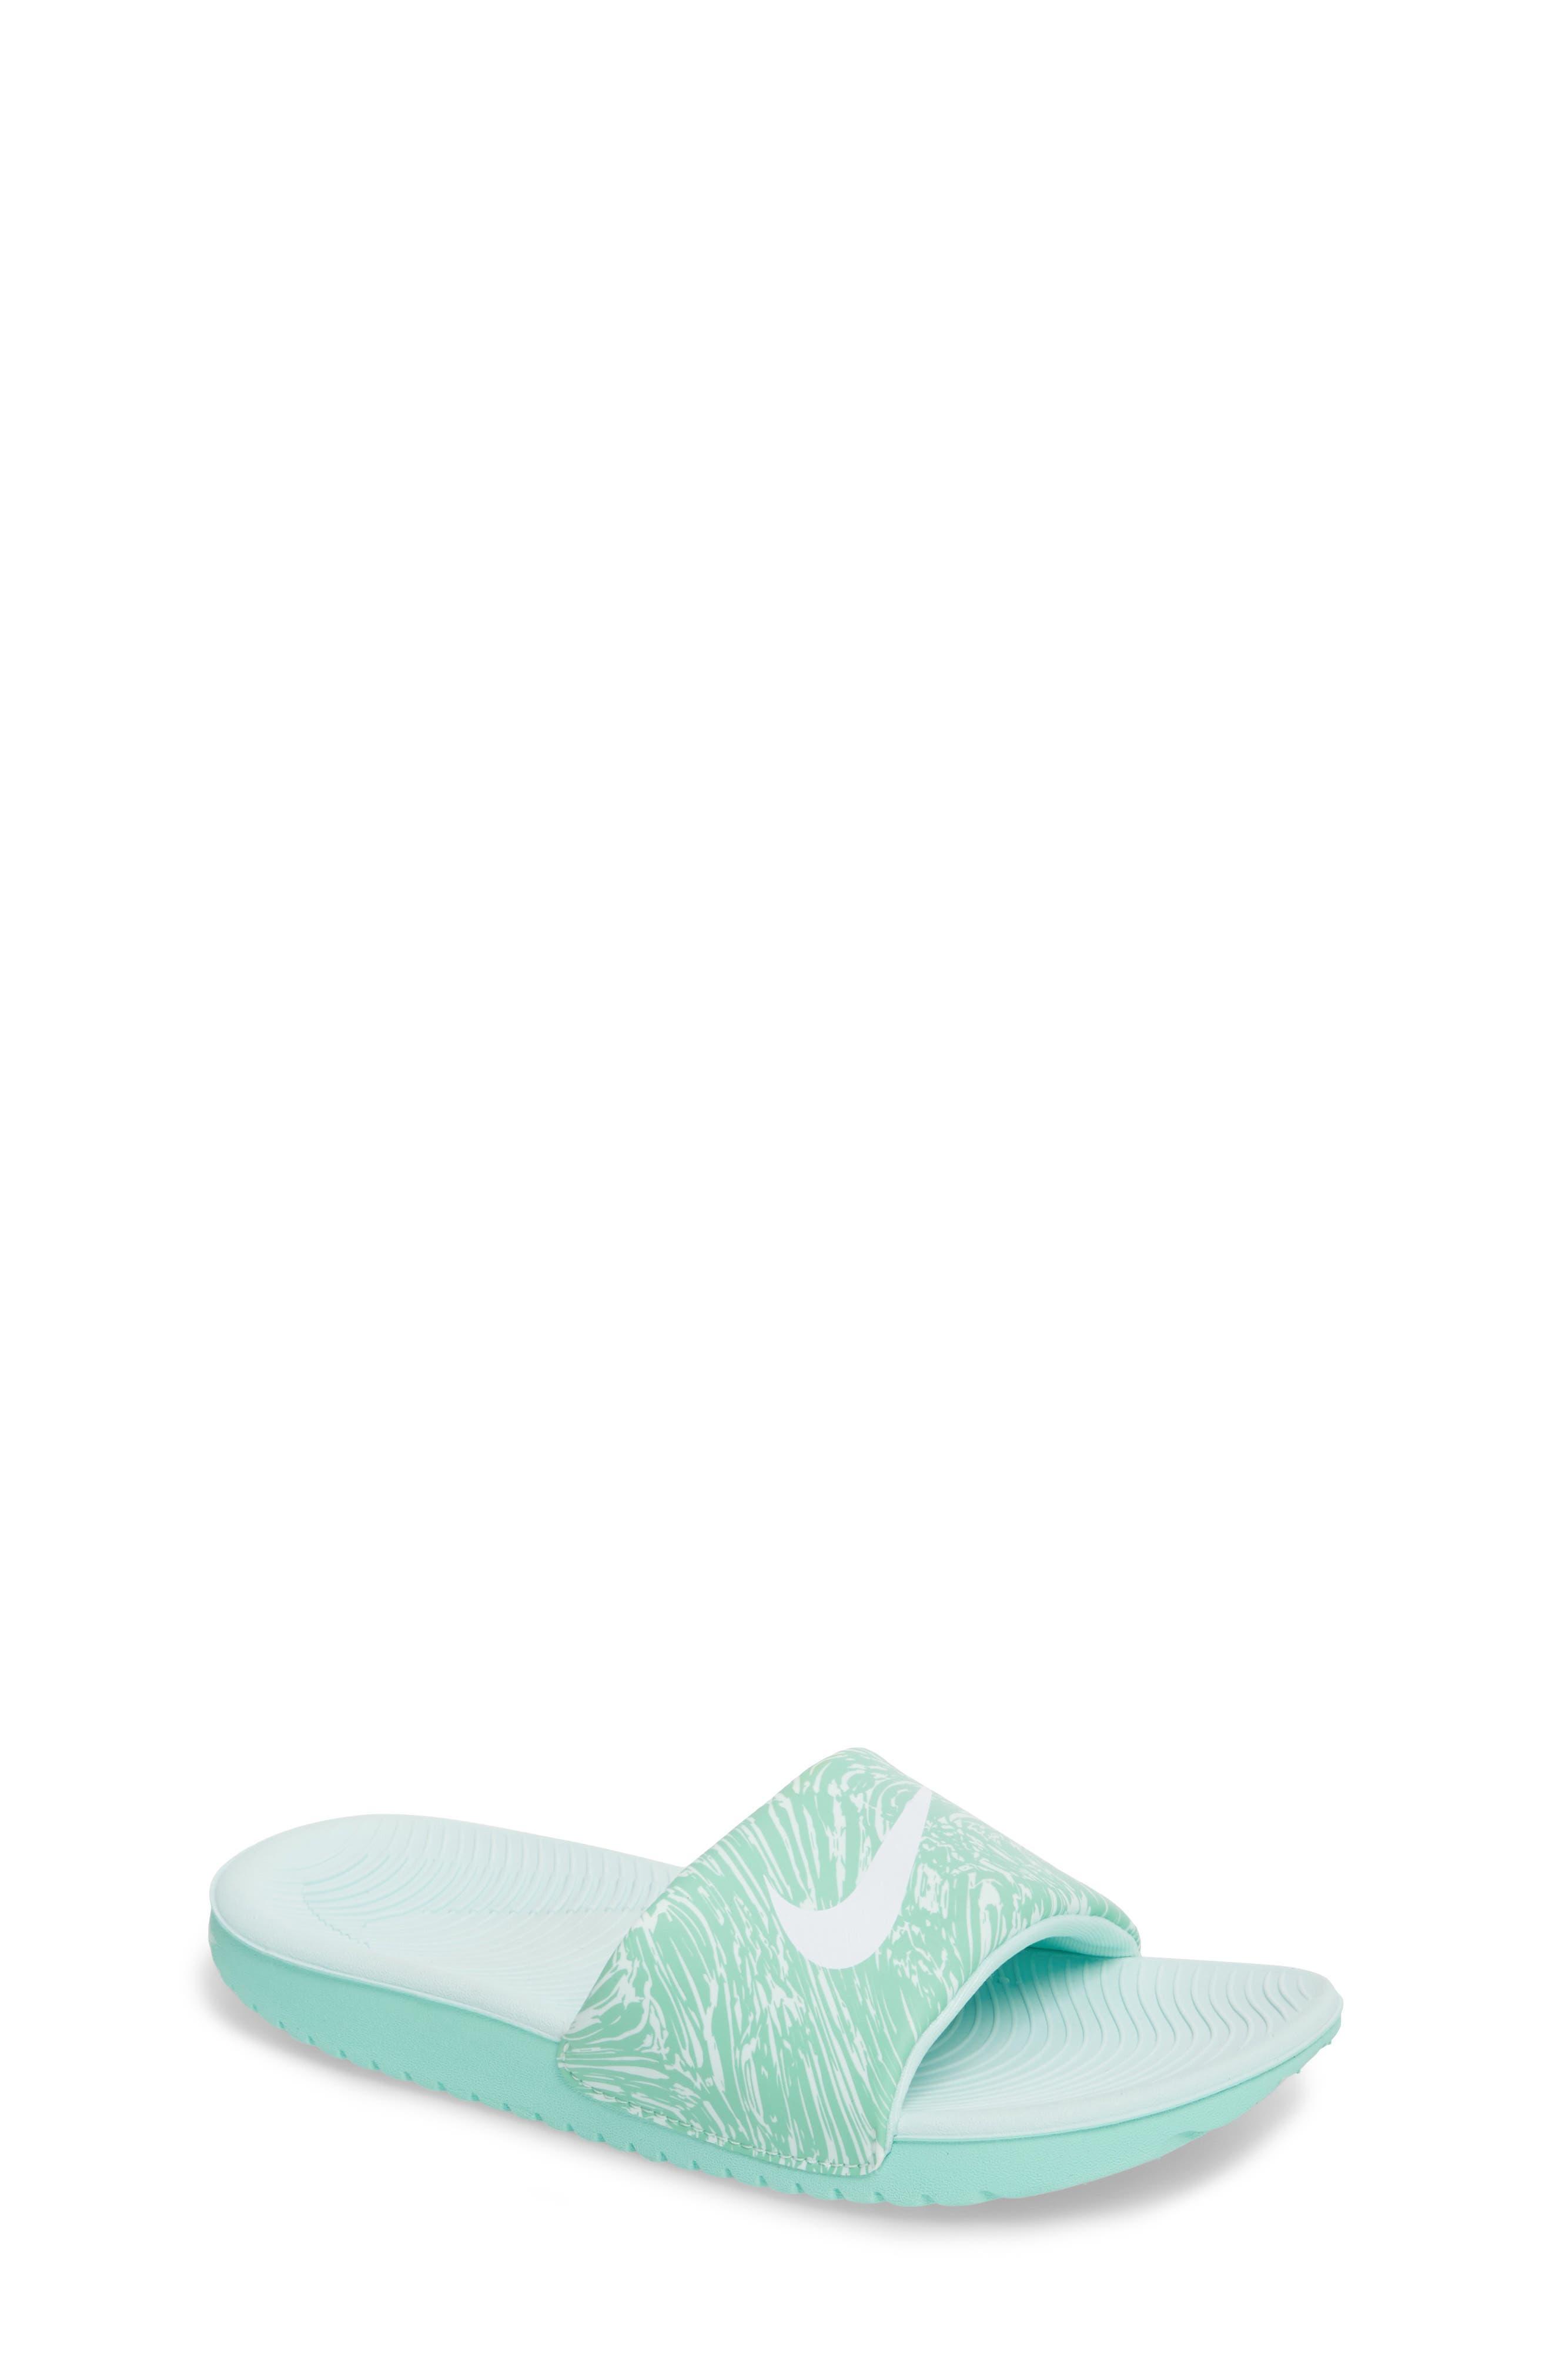 'Kawa' Print Slide Sandal,                             Main thumbnail 3, color,